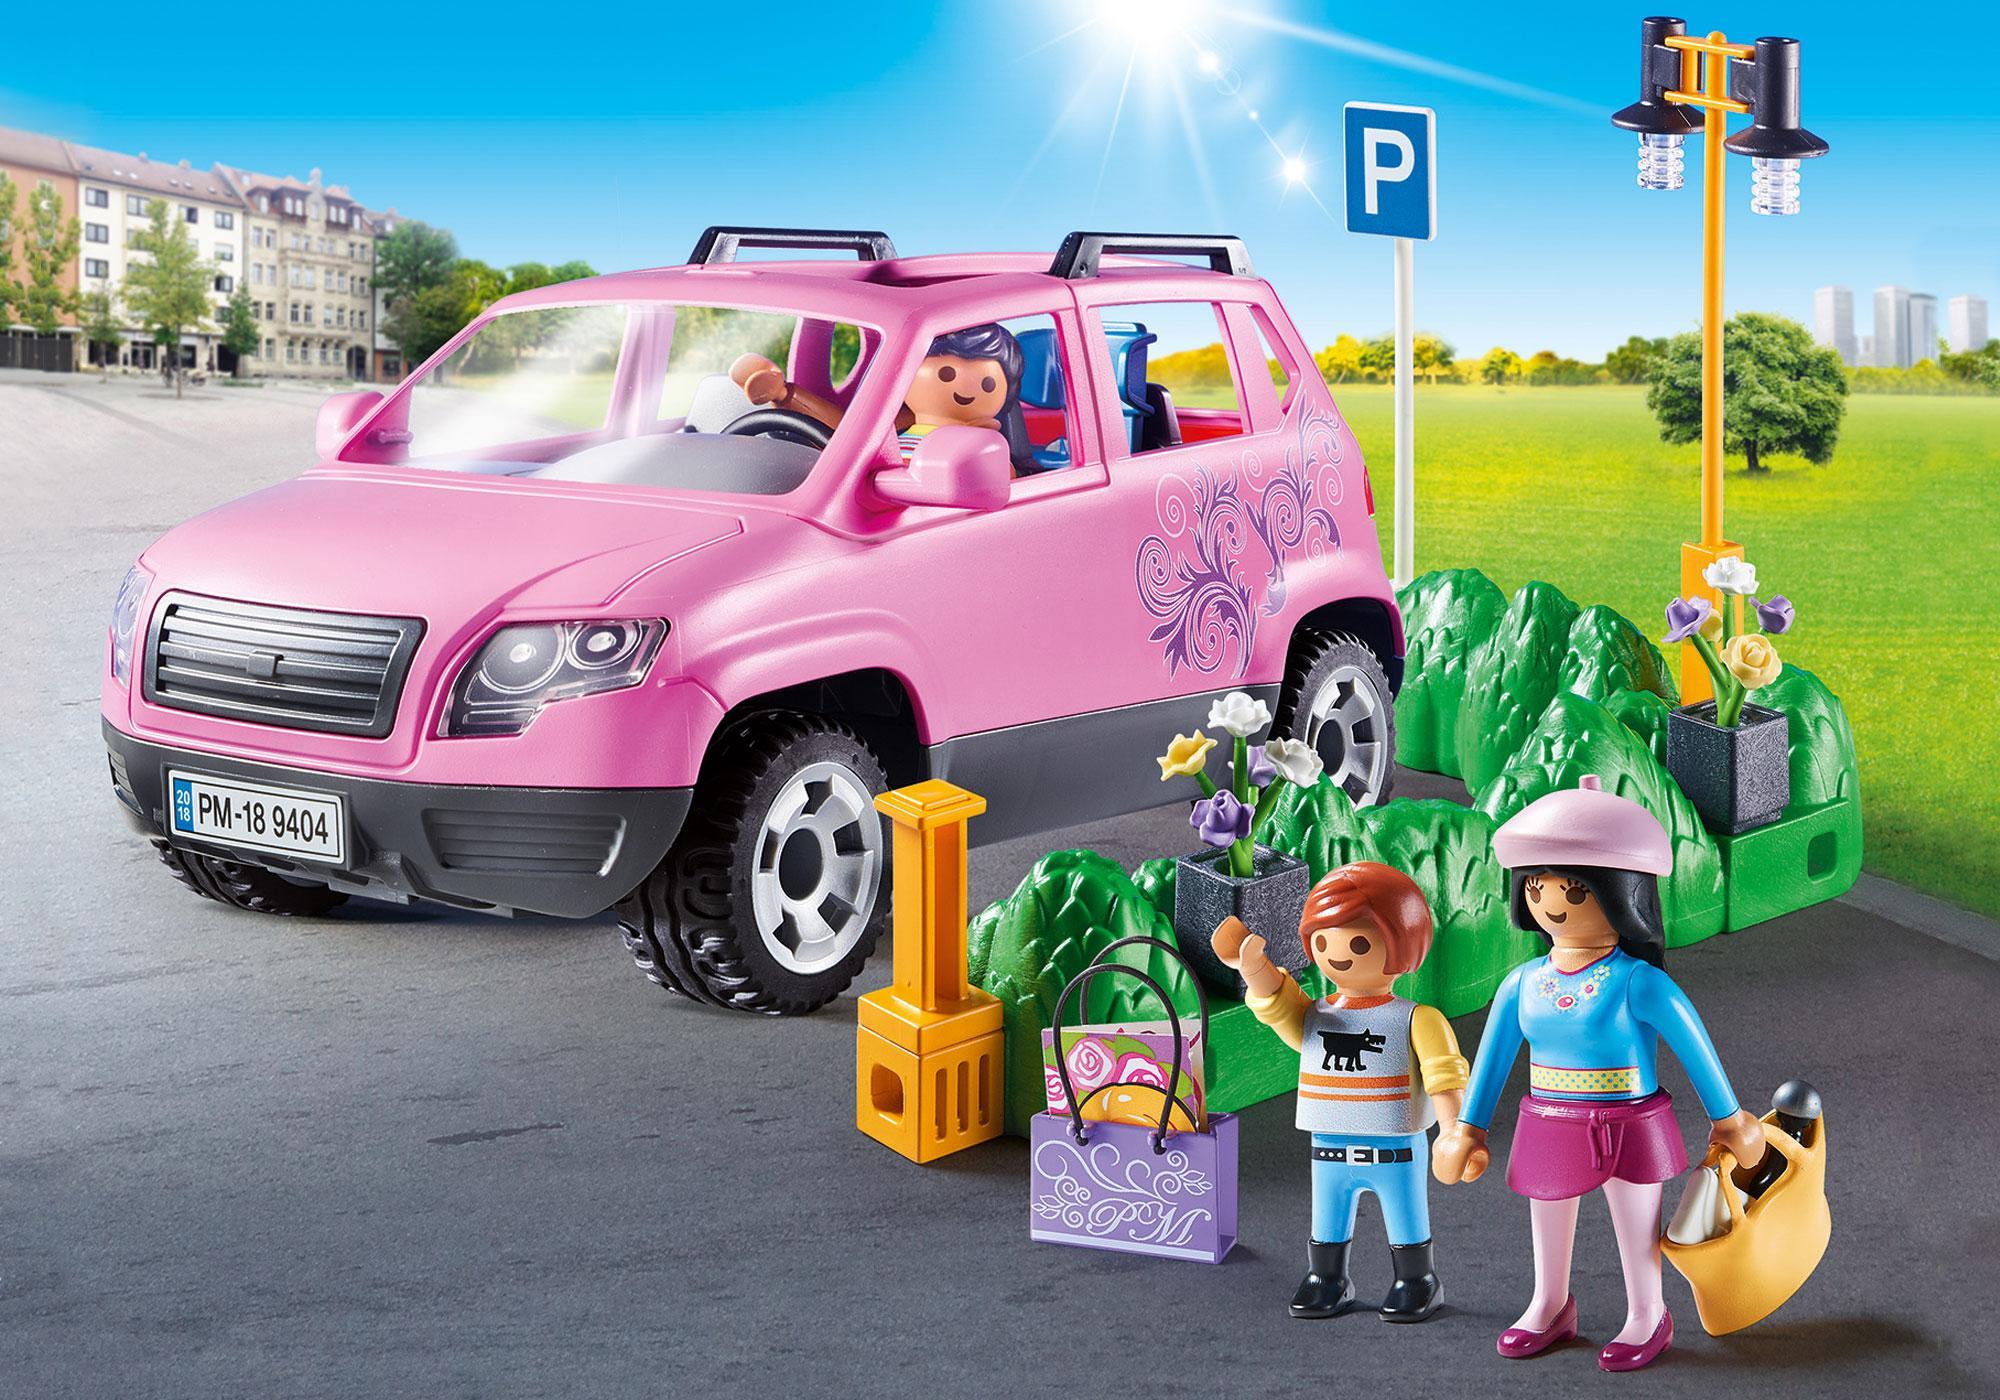 http://media.playmobil.com/i/playmobil/9404_product_detail